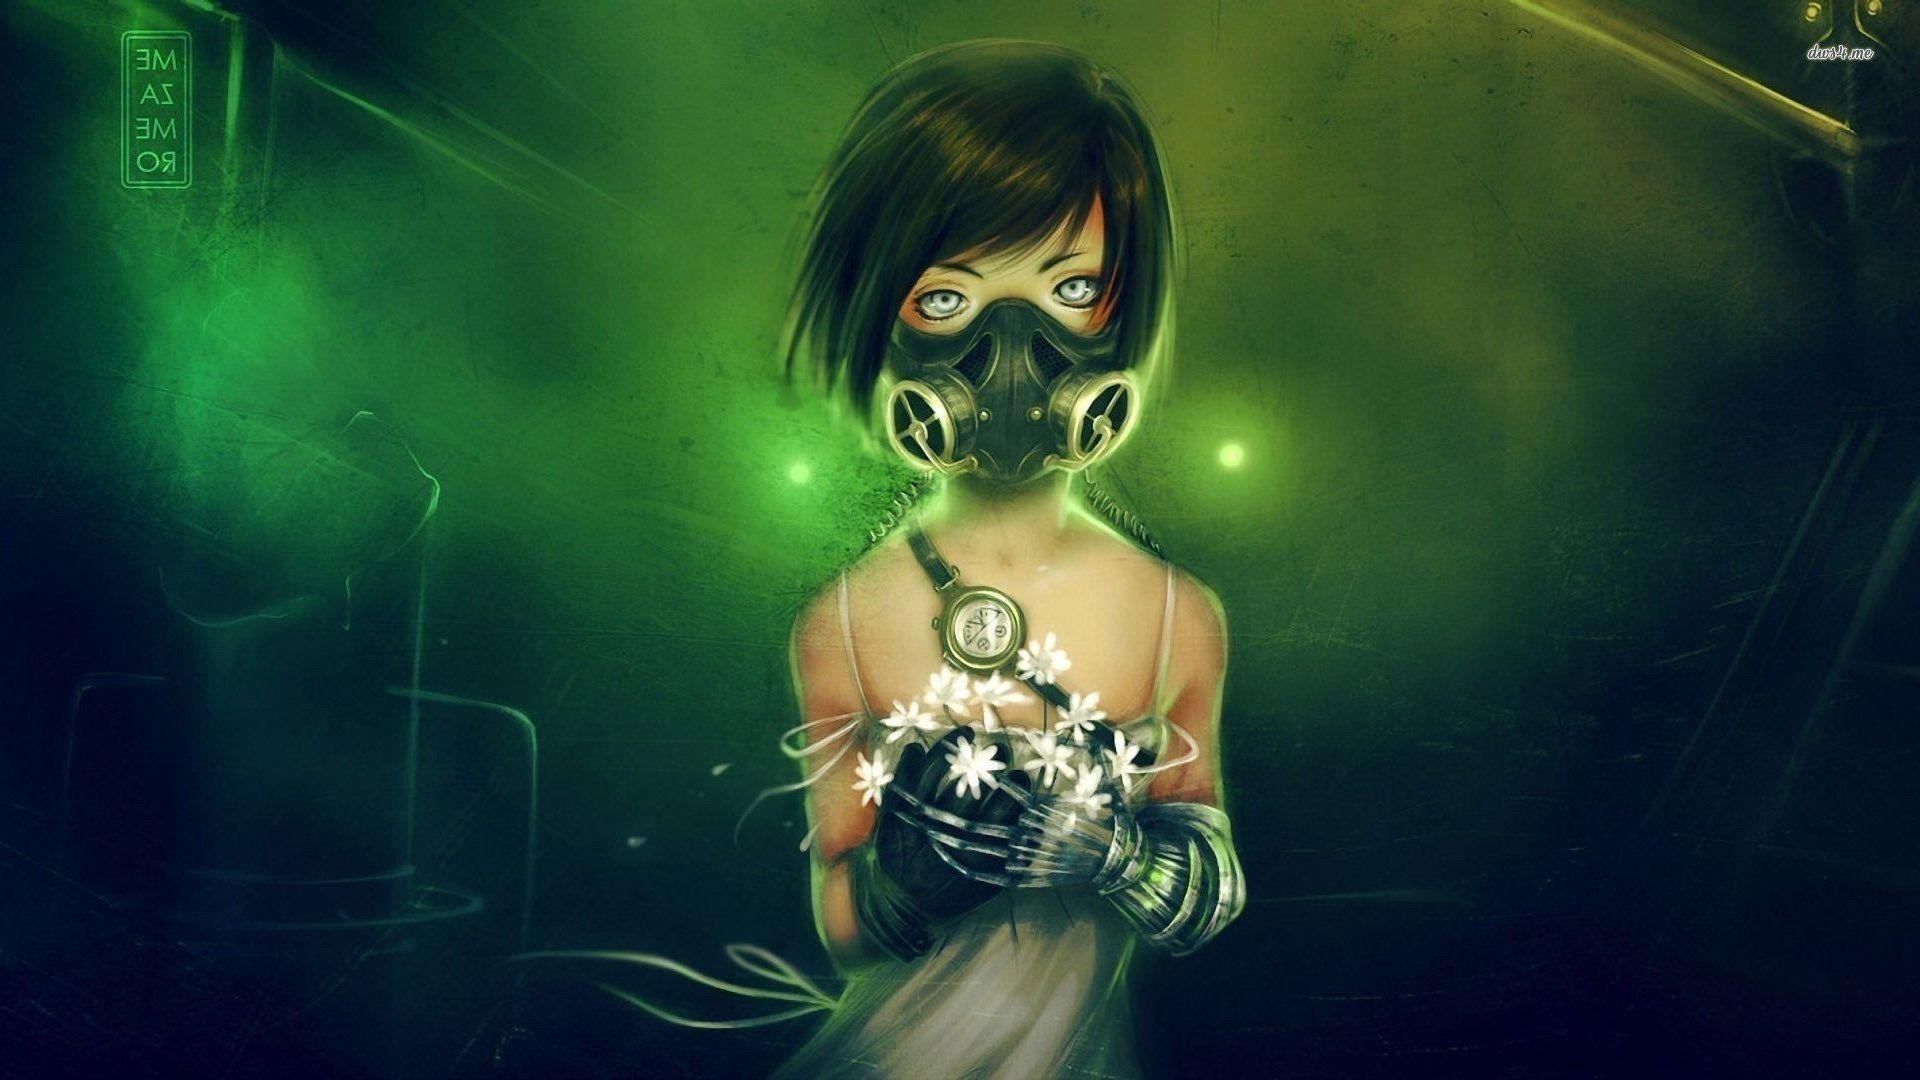 Anime Girl With Gas Mask Desktop Wallpaper